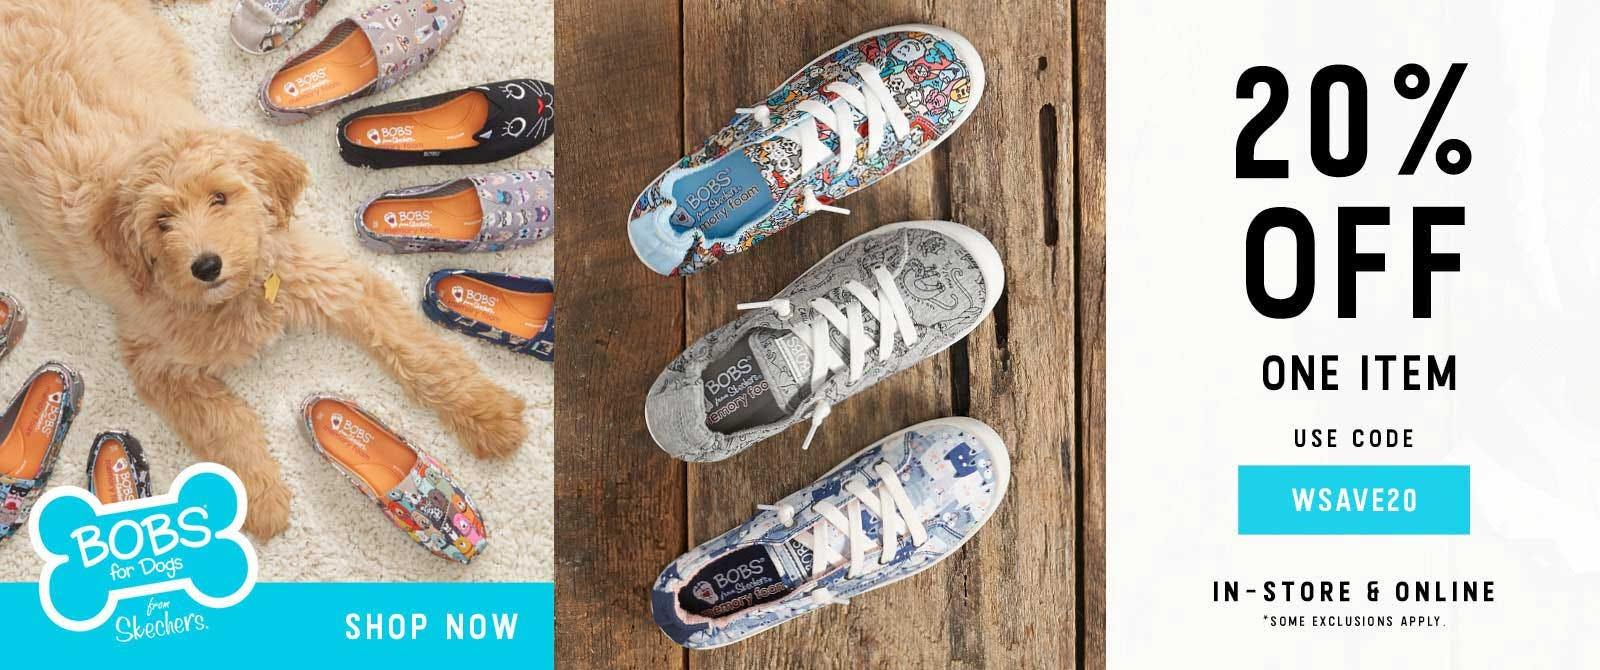 photo regarding Shoe Sensation Printable Coupon identified as Great Bargains upon Brand name Status Footwear Sneakers Shoe Feeling